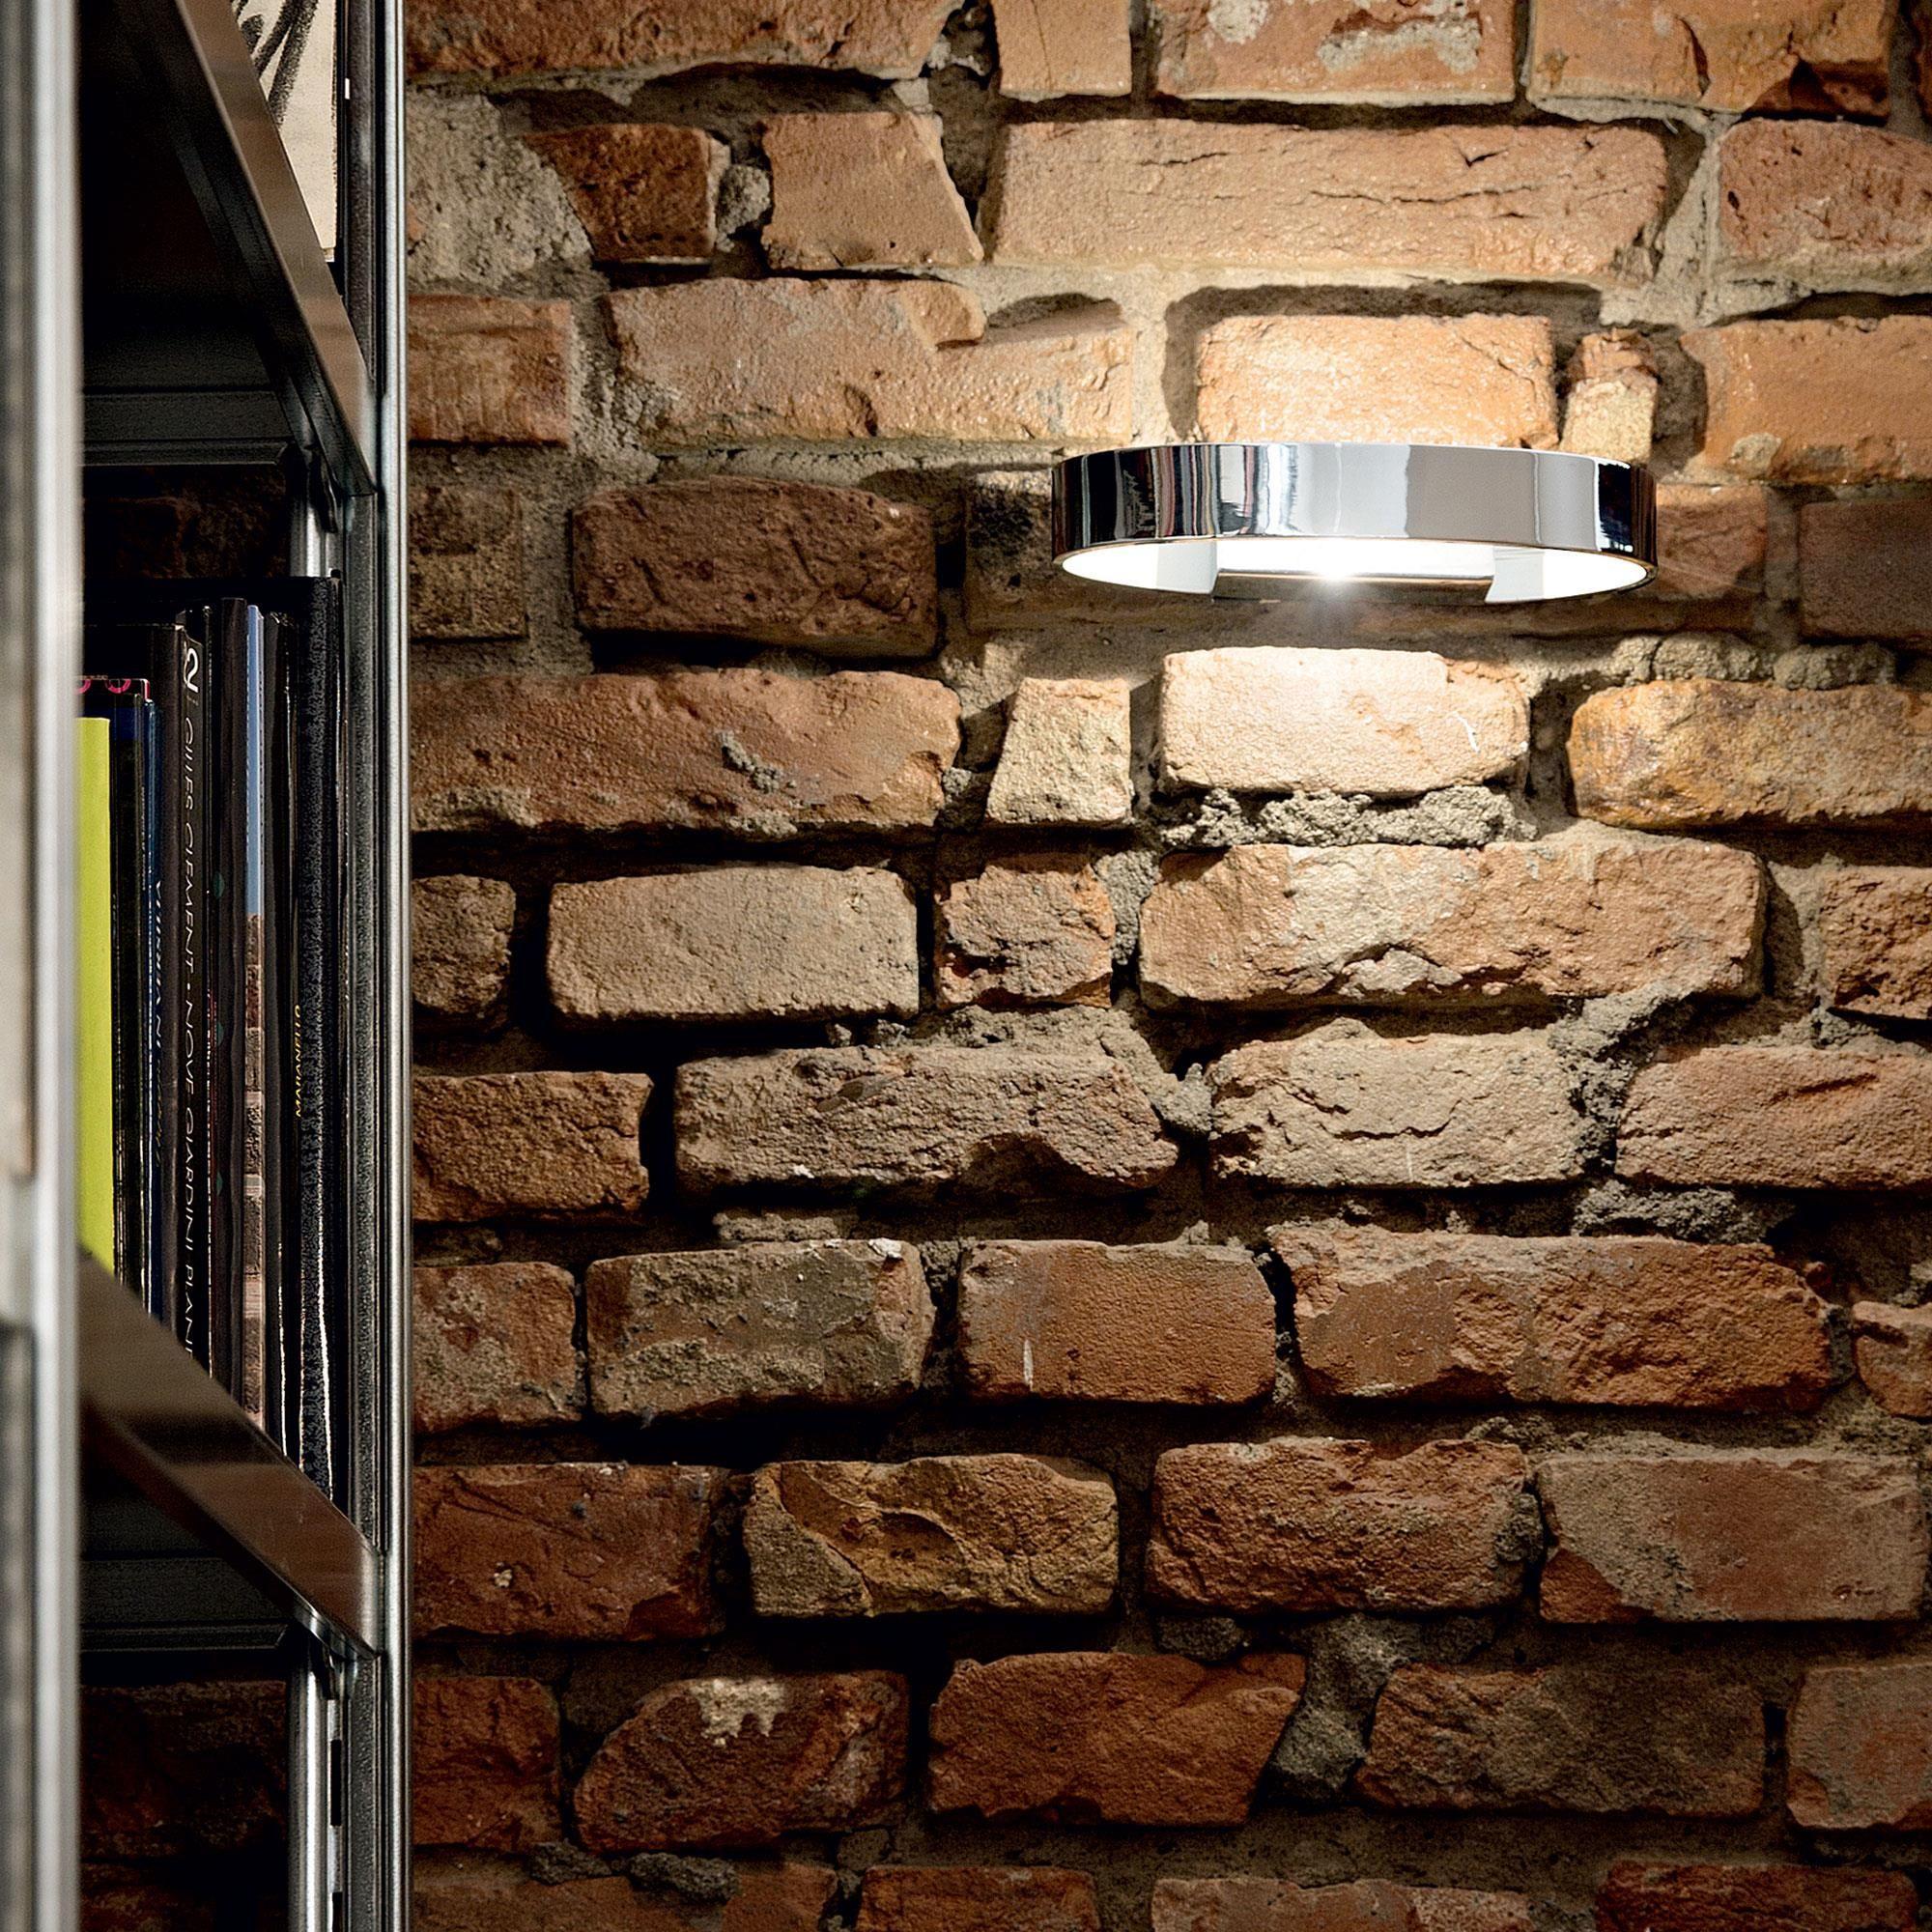 #lighting #interiordesign #design #lightingdesign #light #photography #led #homedecor #architecture #interior #lights #art #decor #lamp #home #furniture #interiors #ledlights #lightingdesigner #chandelier #ledlighting #d #love #decoration #homedesign #lamps #photooftheday #instagood #luxury #bhfyp